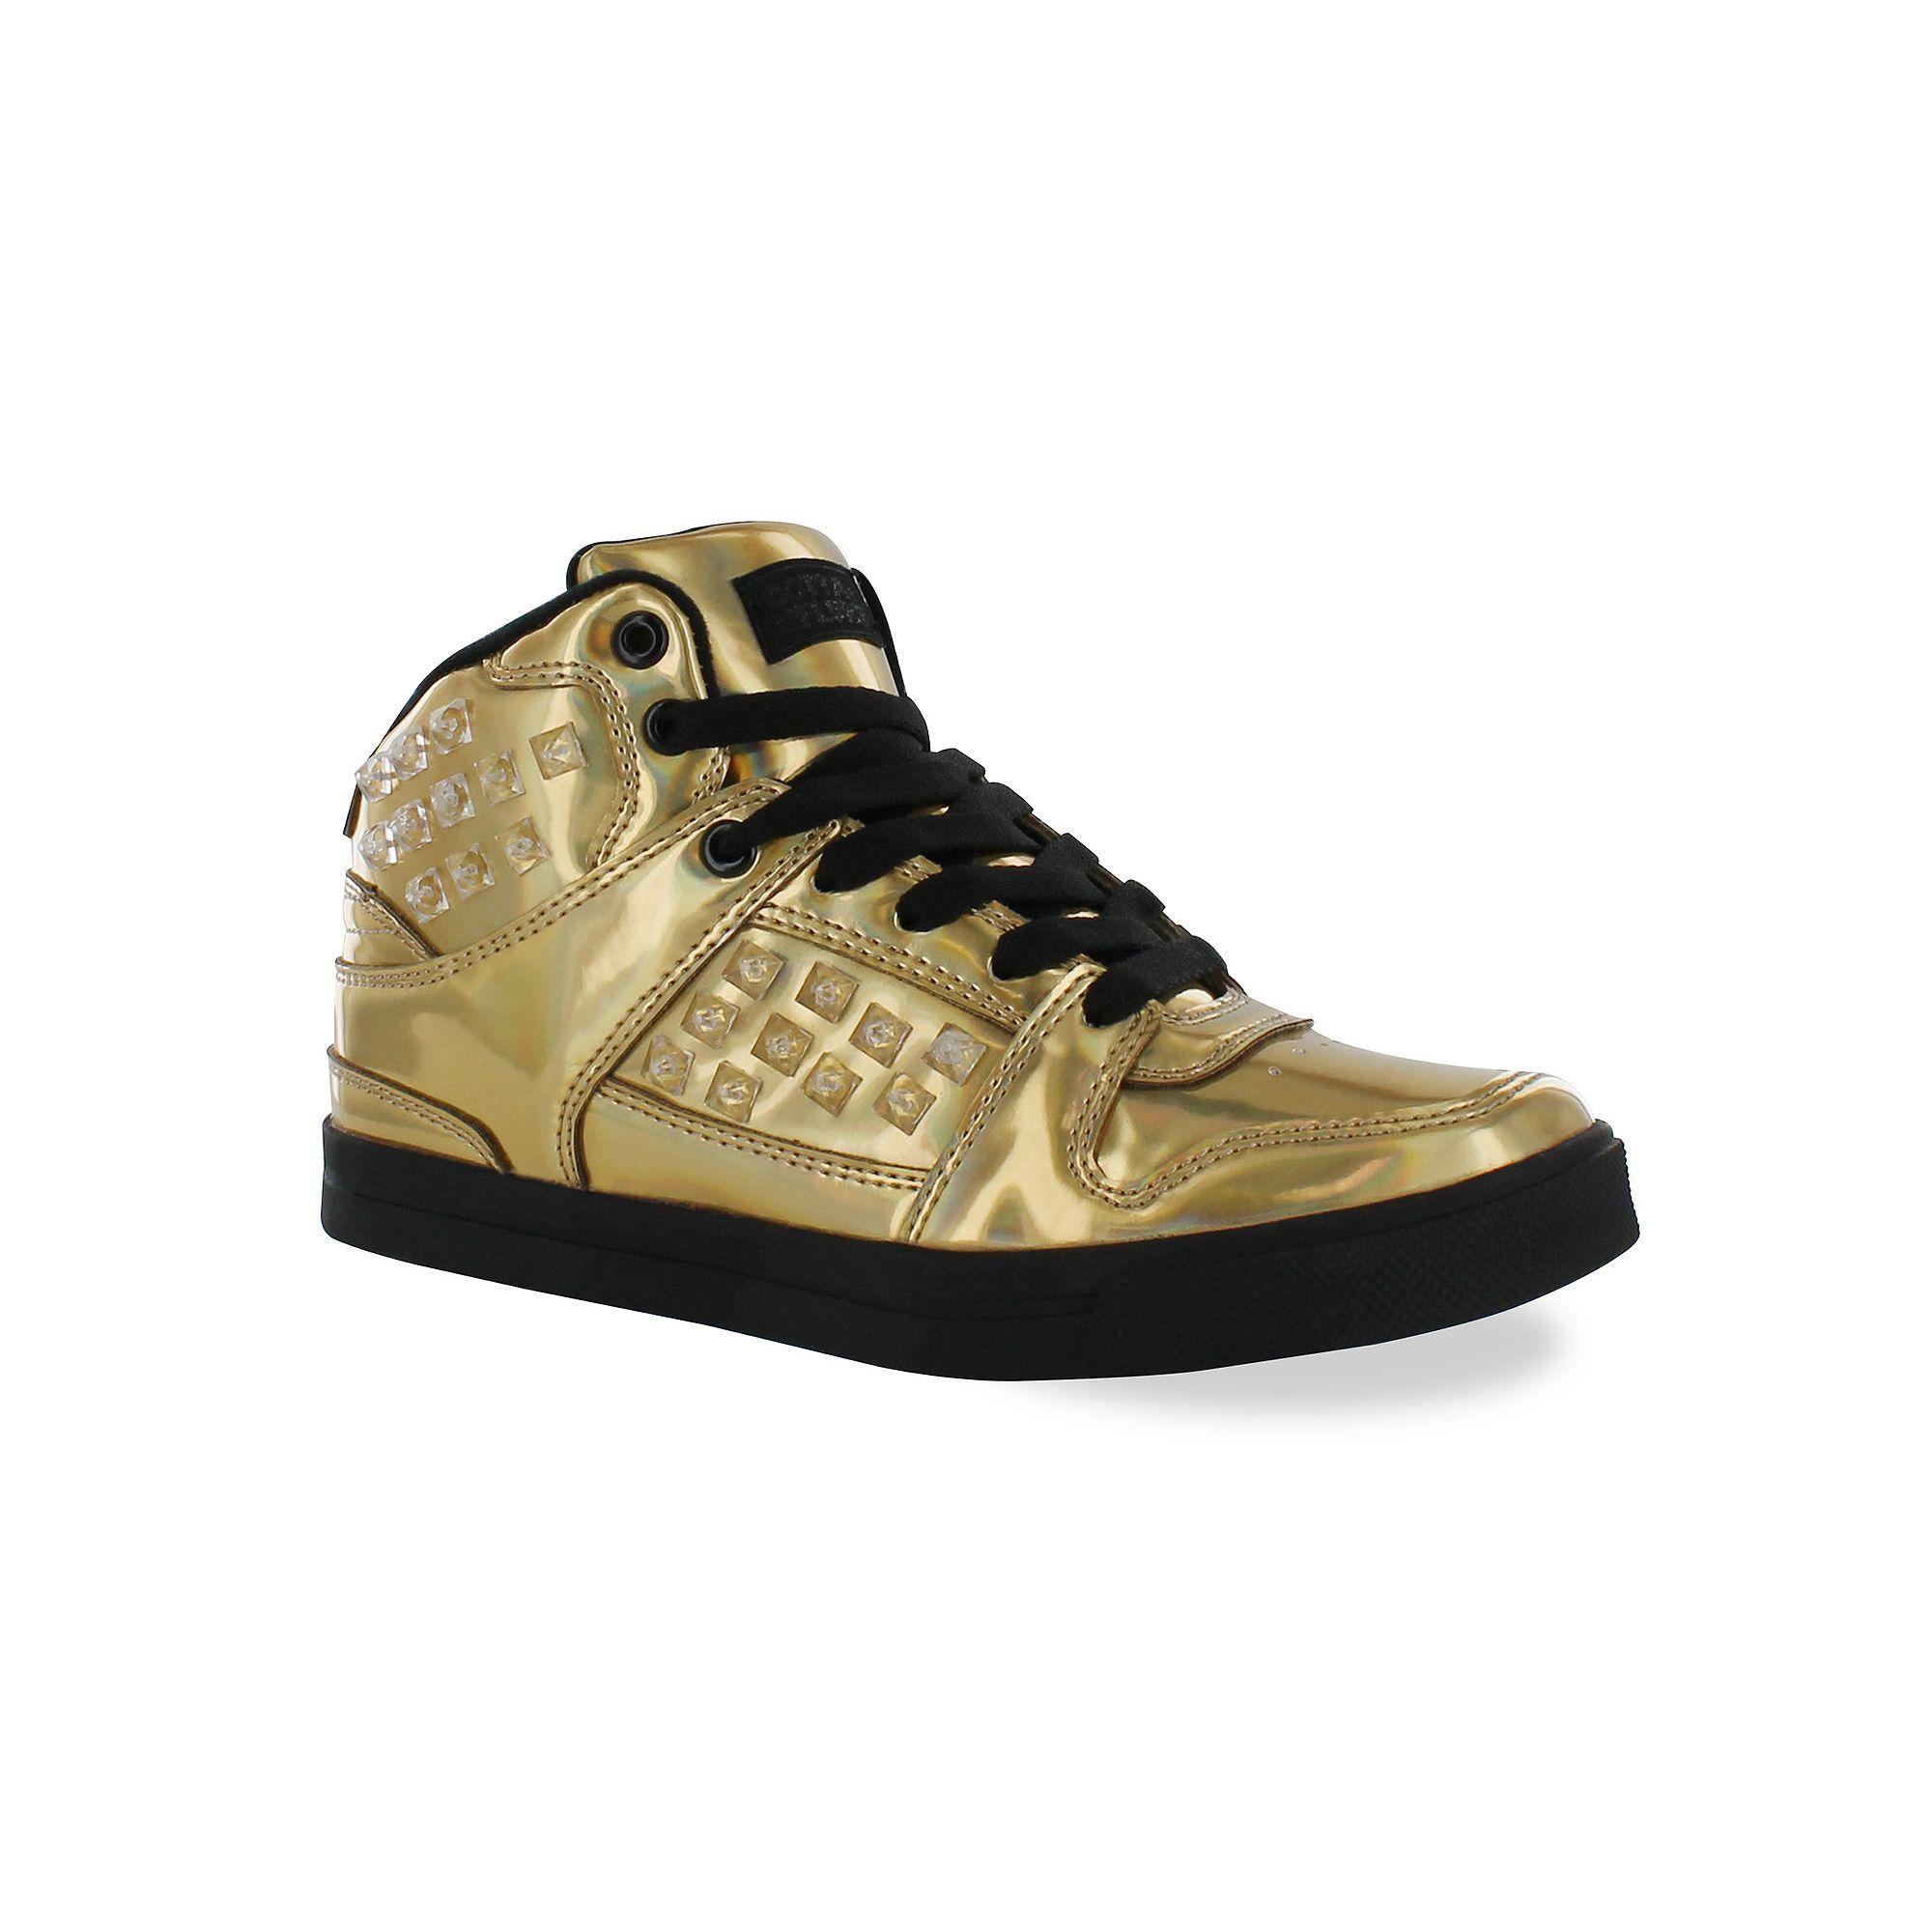 Gotta Flurt Hip Hop HD Women's ... High-Top Dance Shoes cheap sale get to buy CcezauhBu